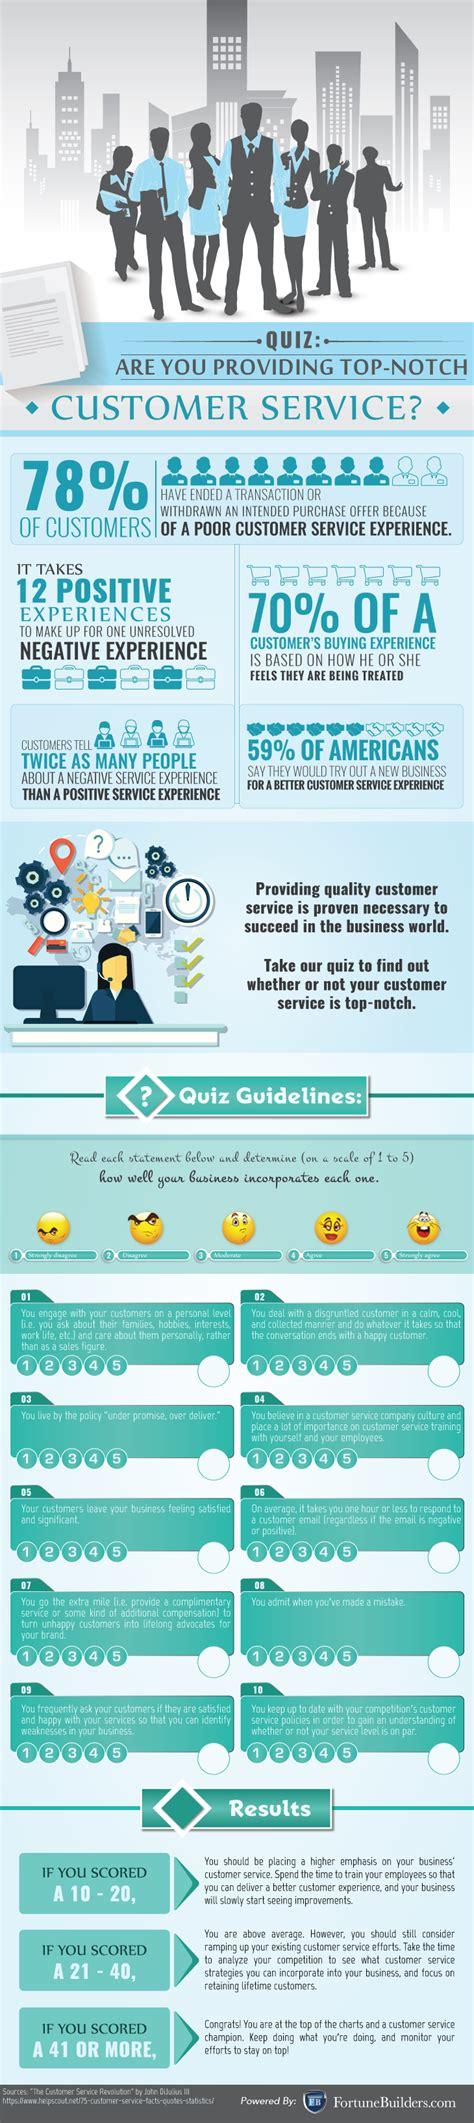 are you providing top notch customer service quiz